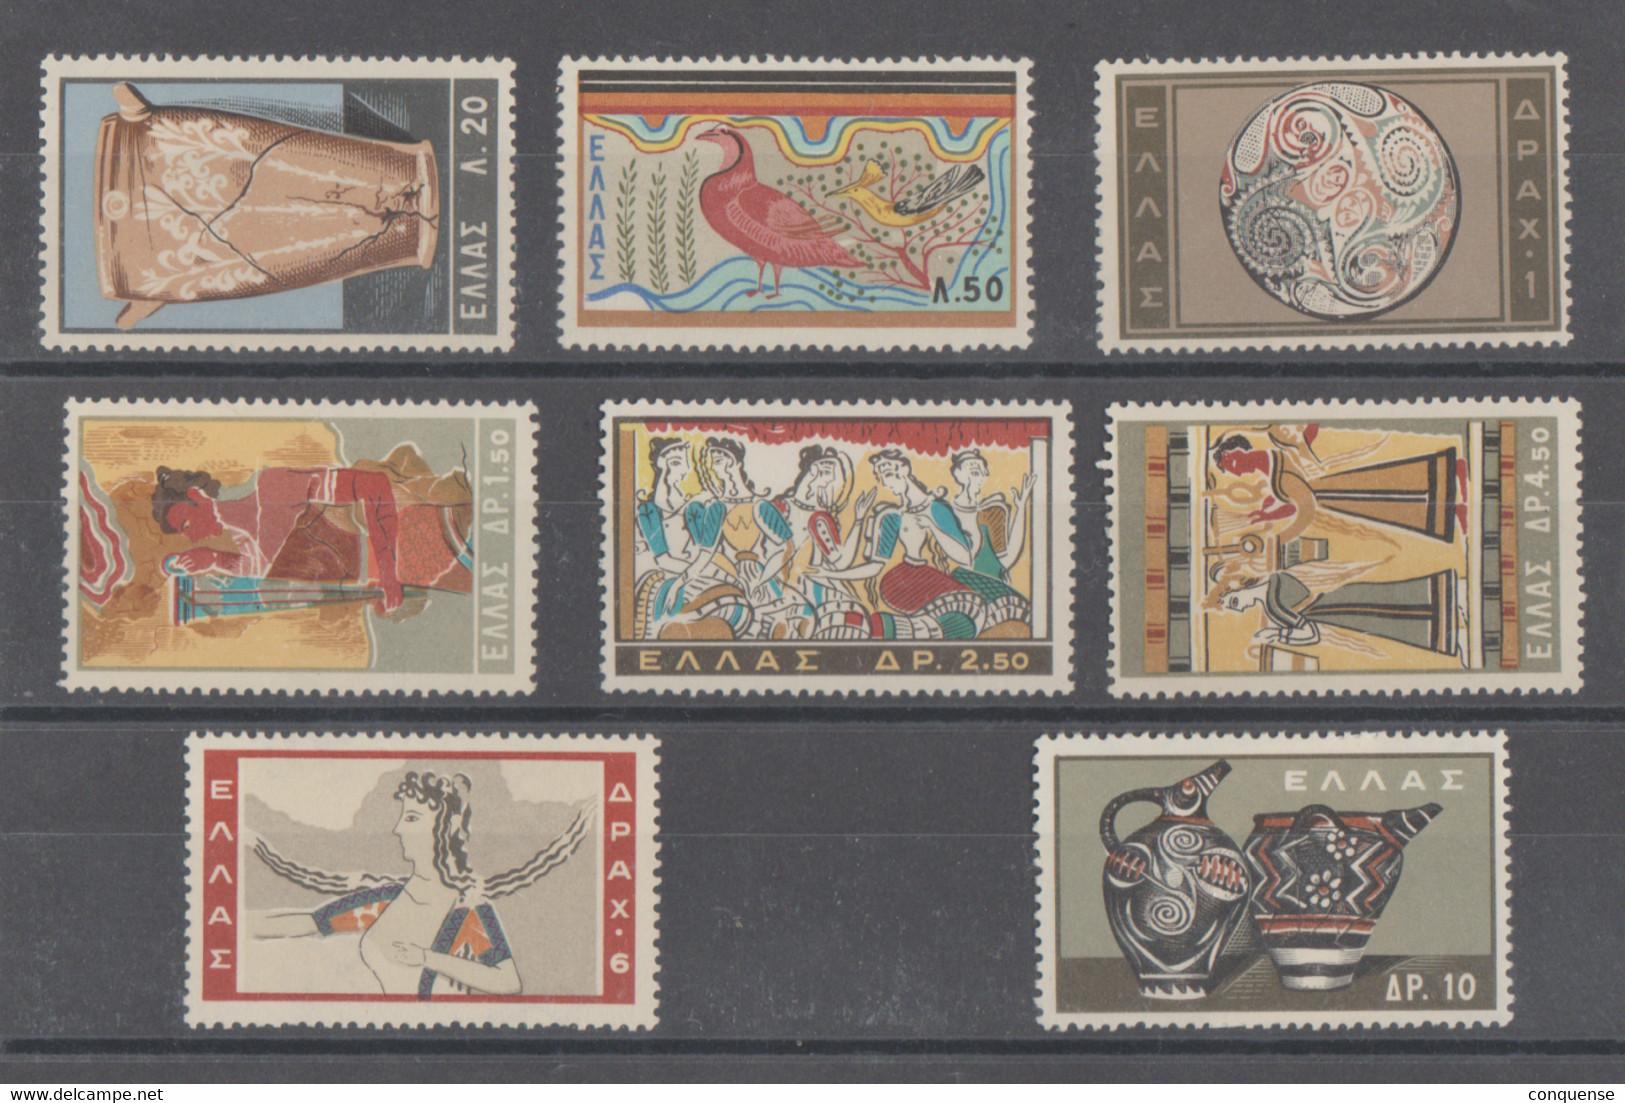 Grecia  **  Mnh  1961  Yvert    743/50  Valor   32 € - Unused Stamps